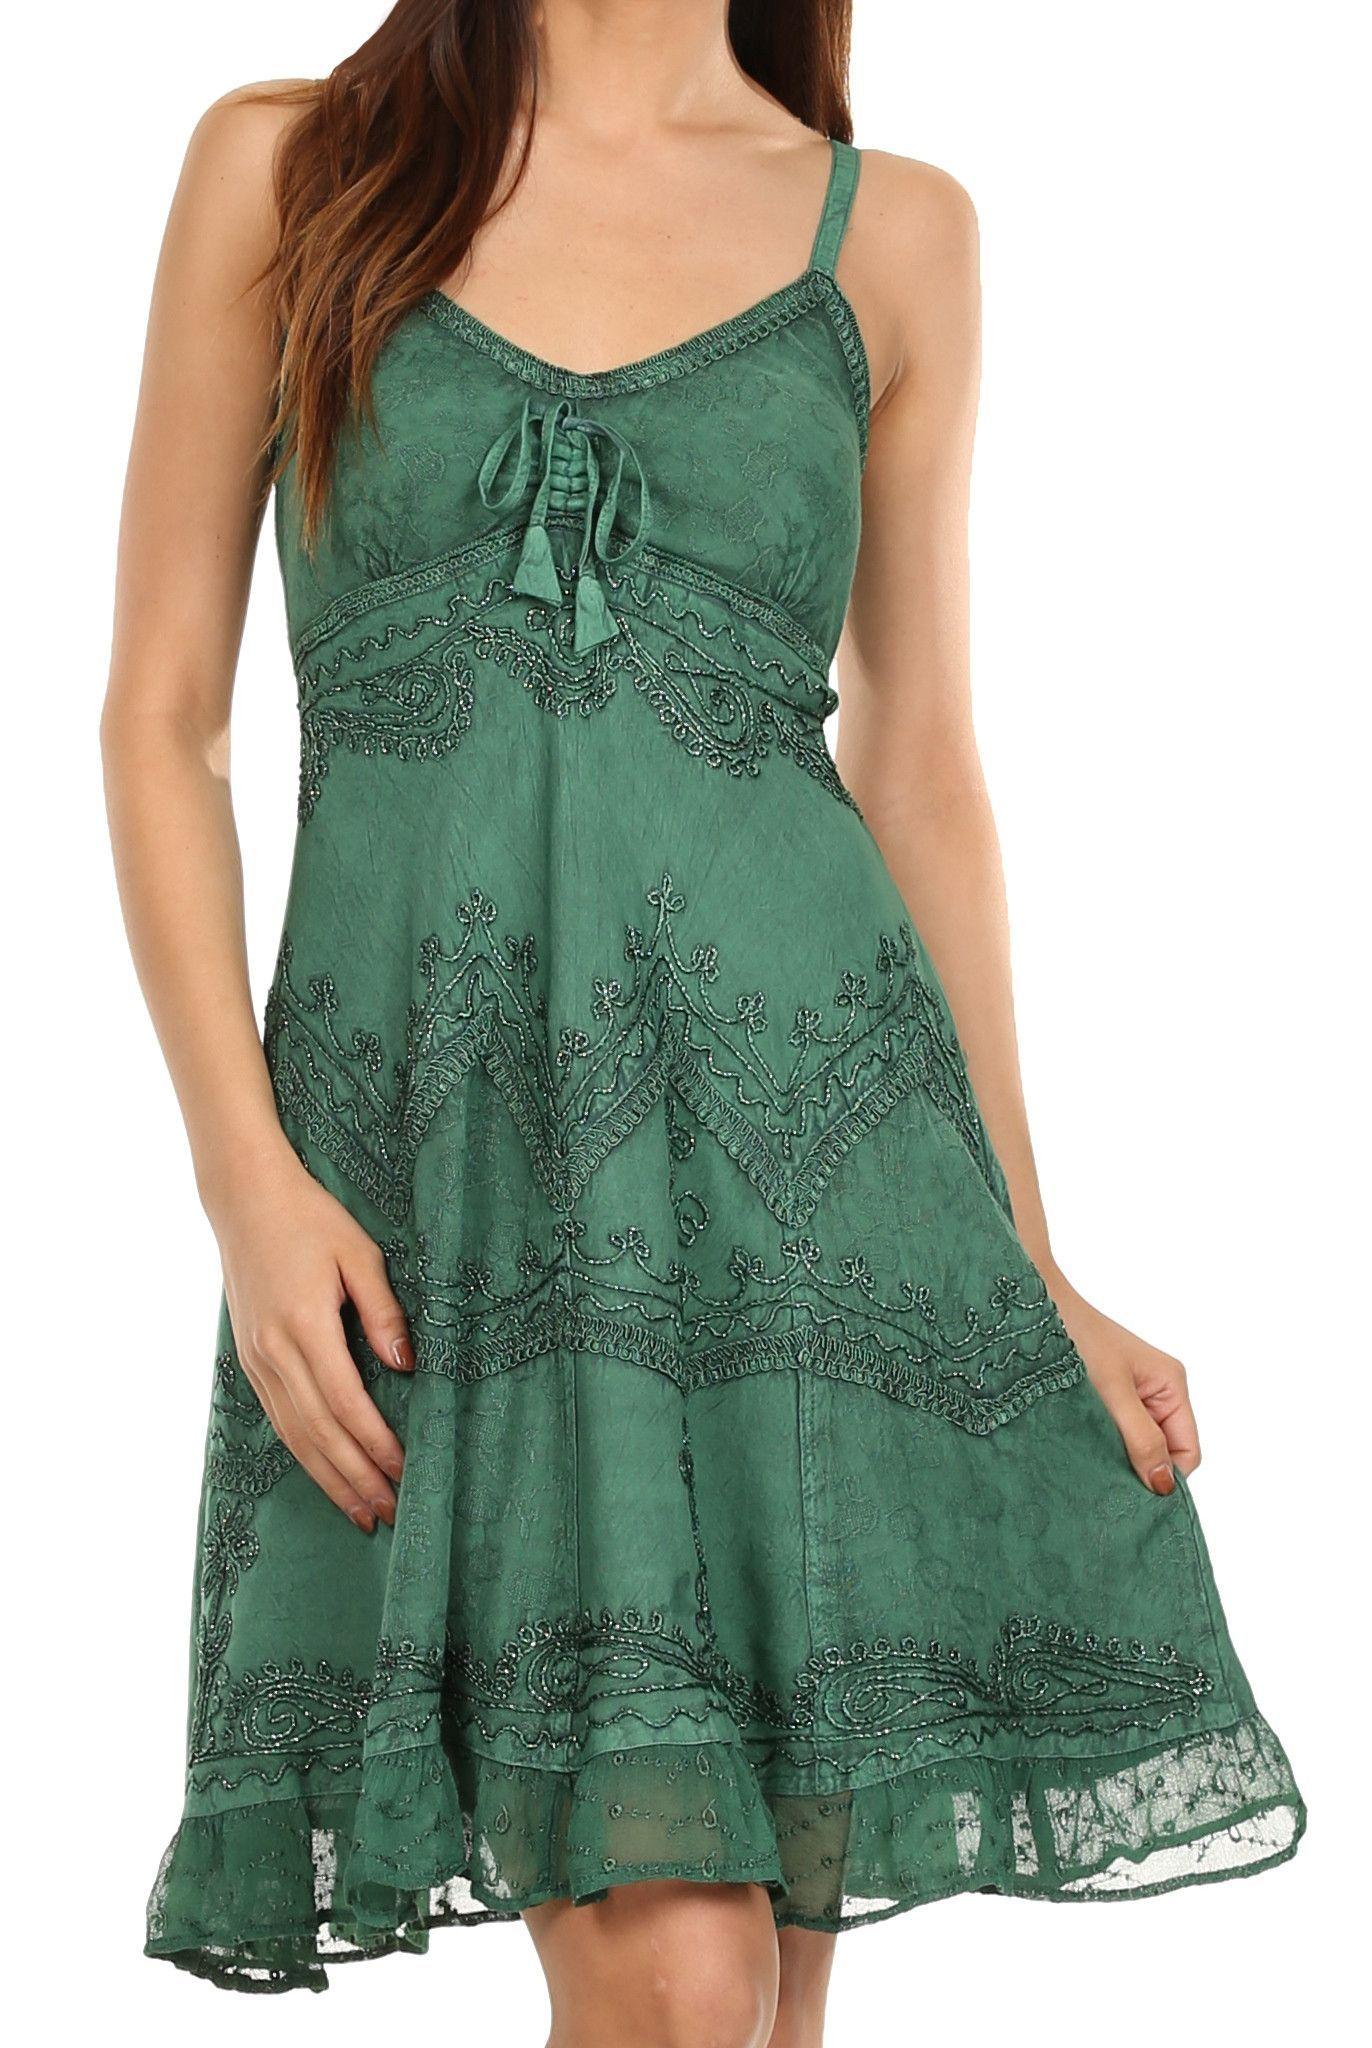 220239532a62 Sakkas Stonewashed Rayon Adjustable Spaghetti Straps Mid Length Dress